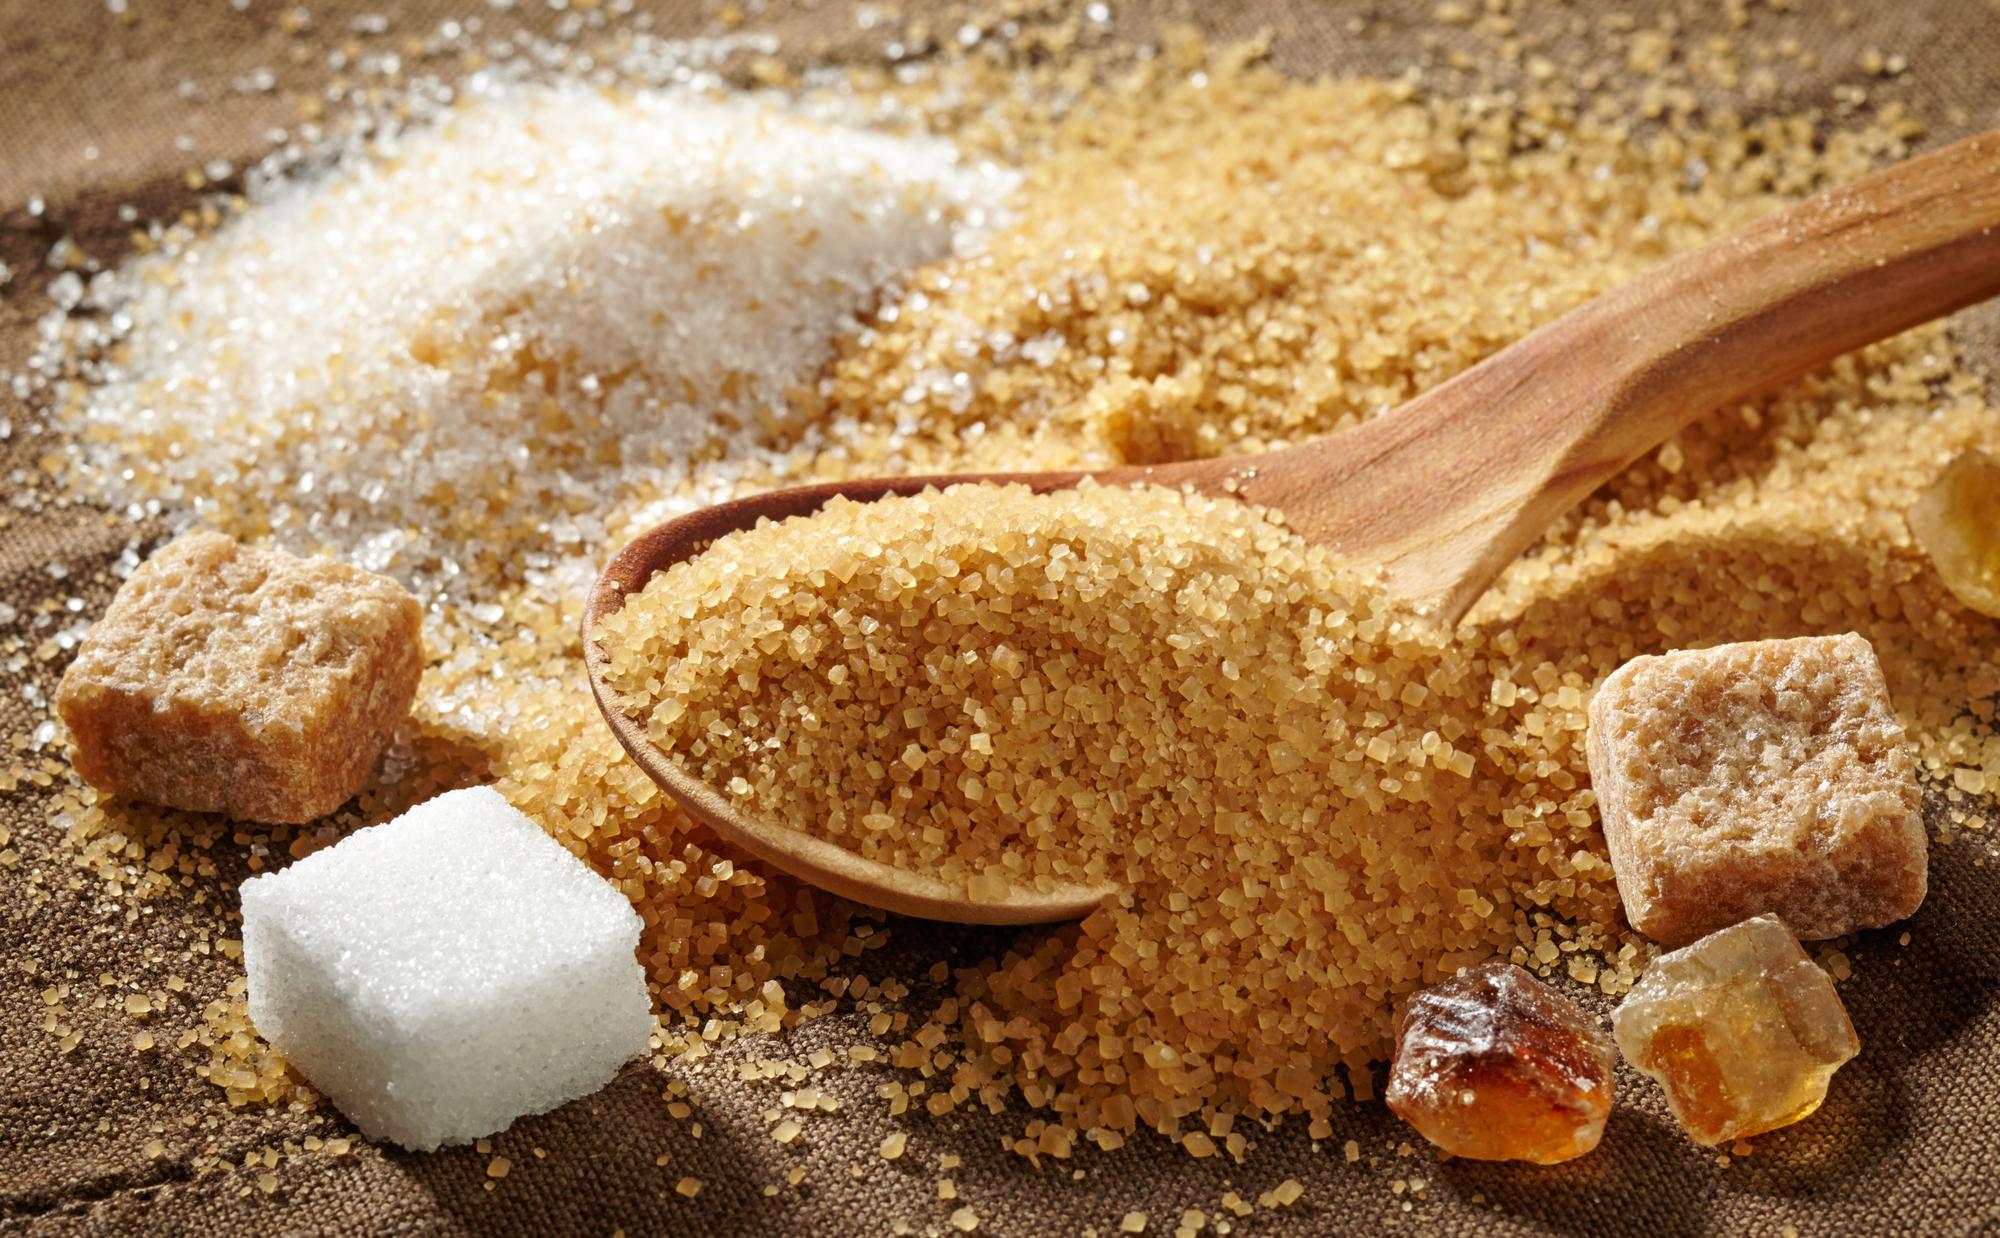 Какой тип сахара полезнее?